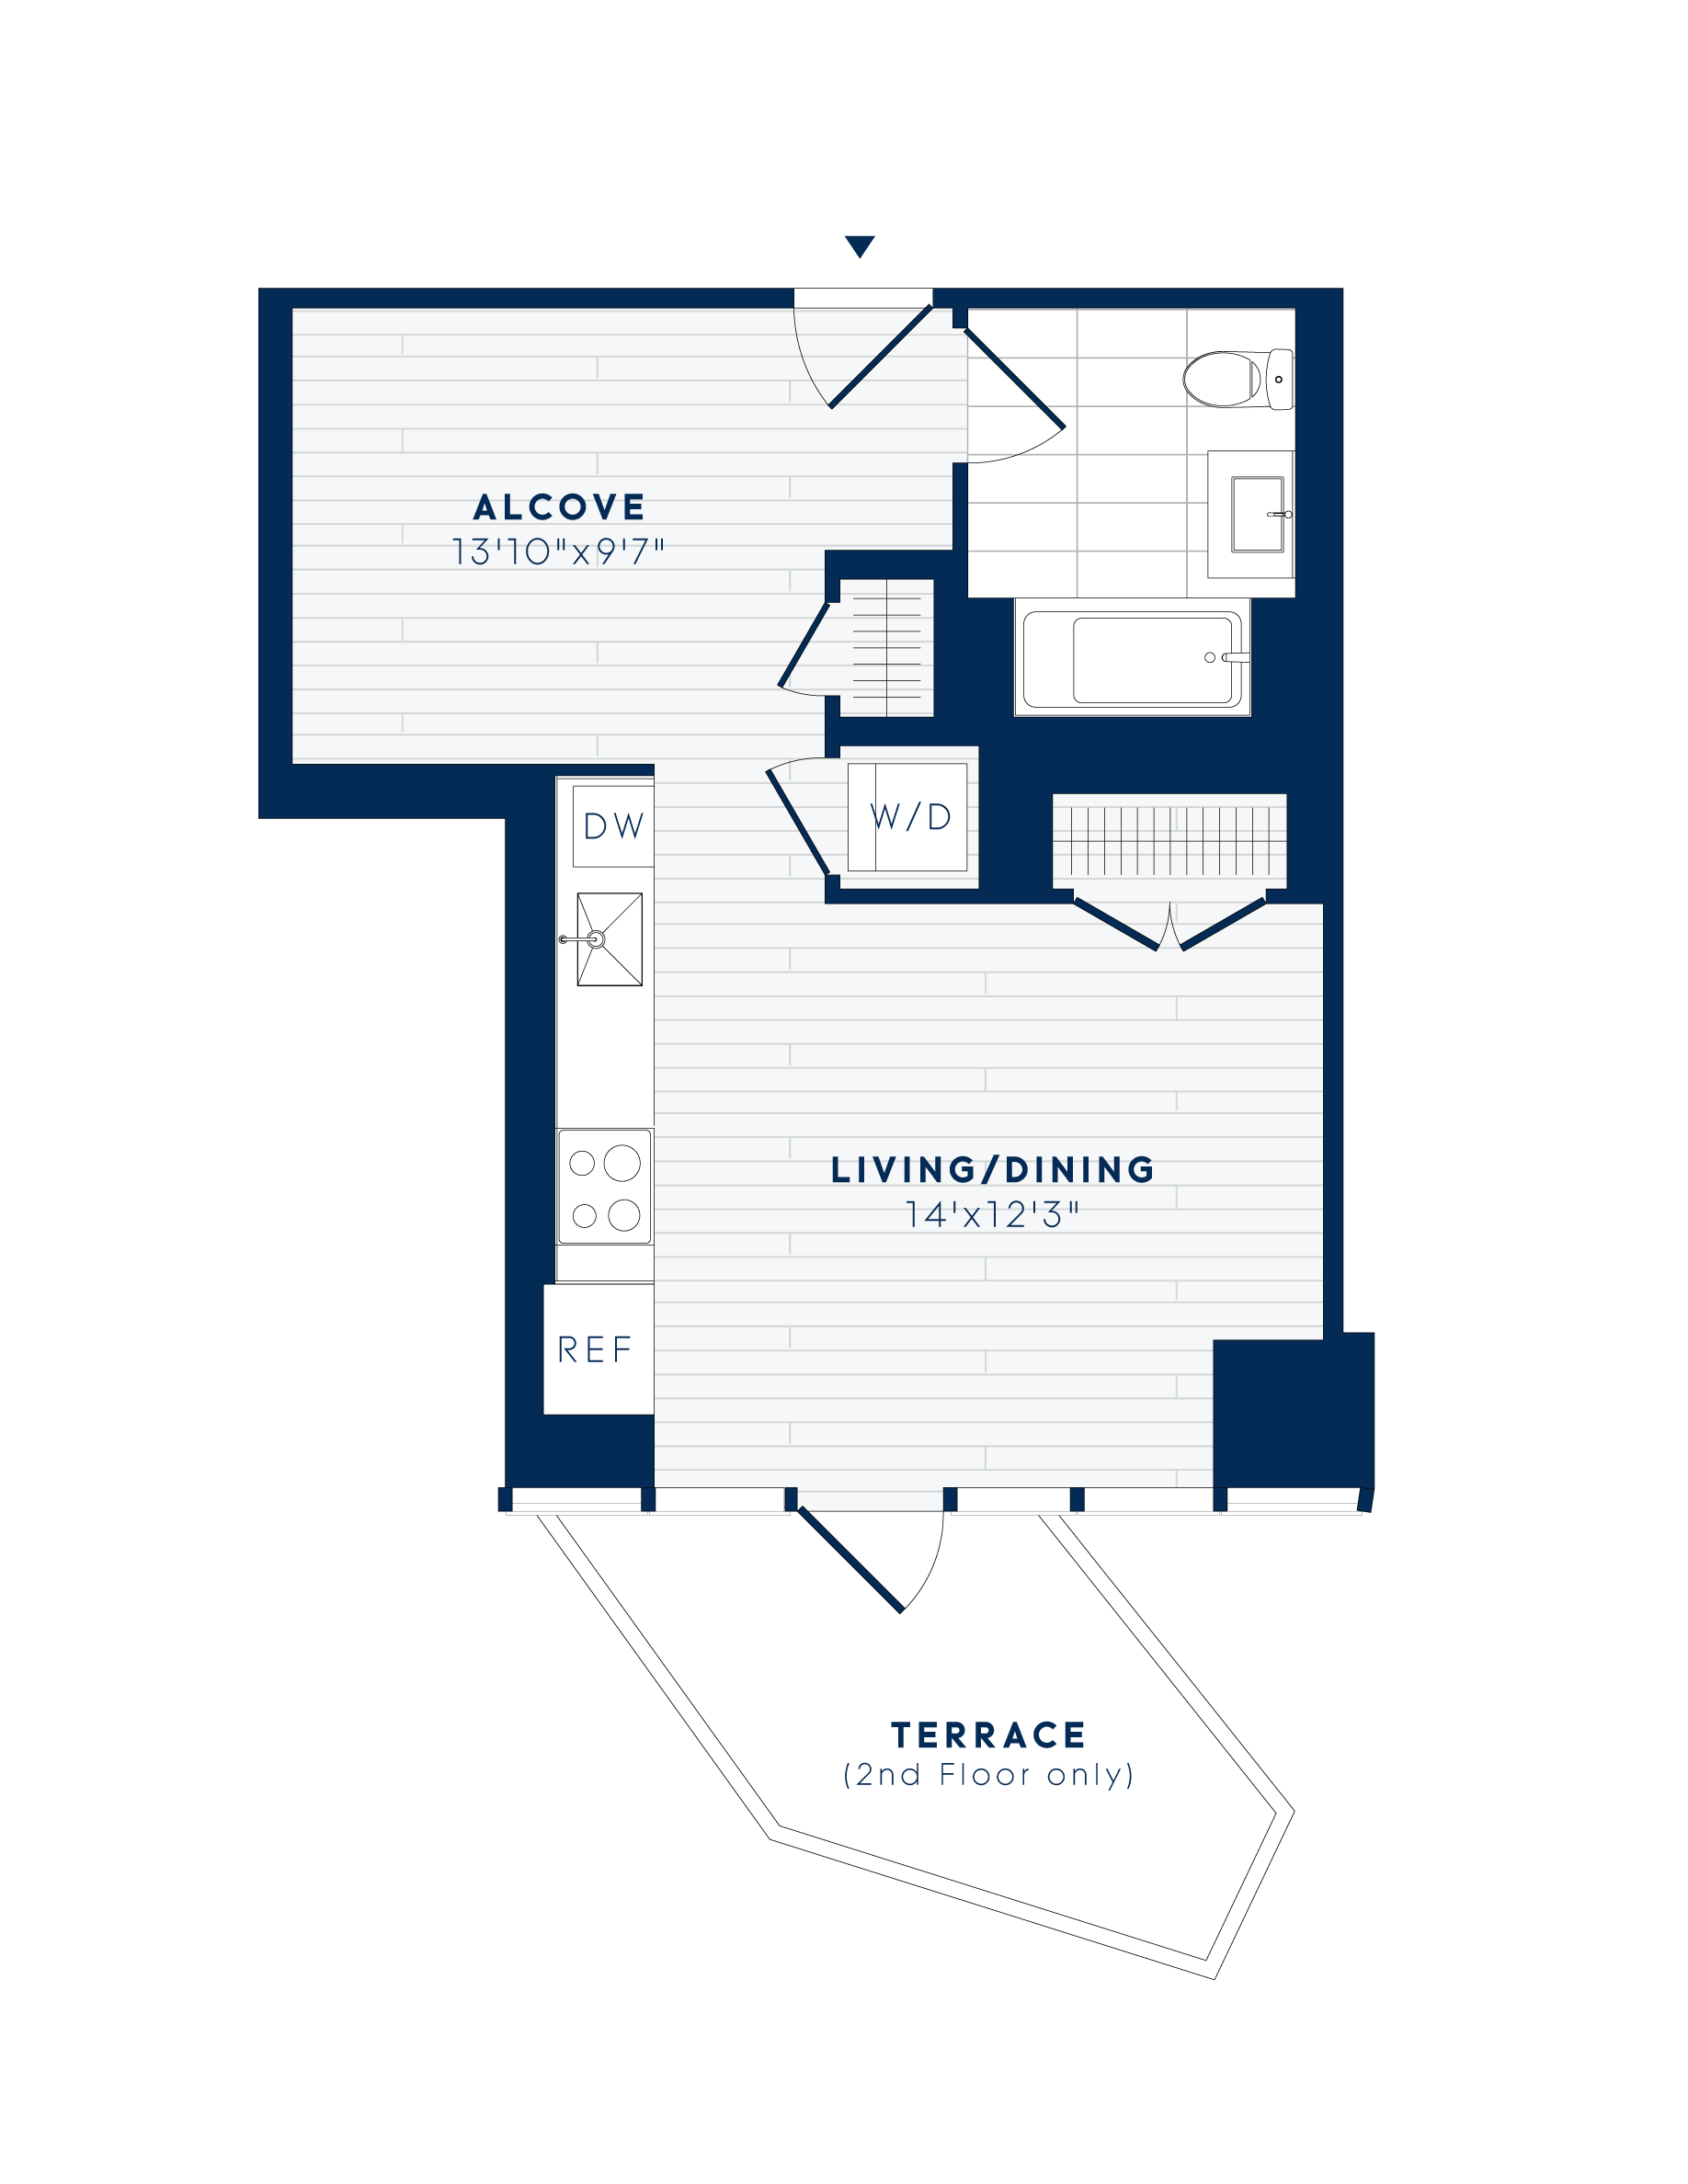 floor plan image of apartment 615